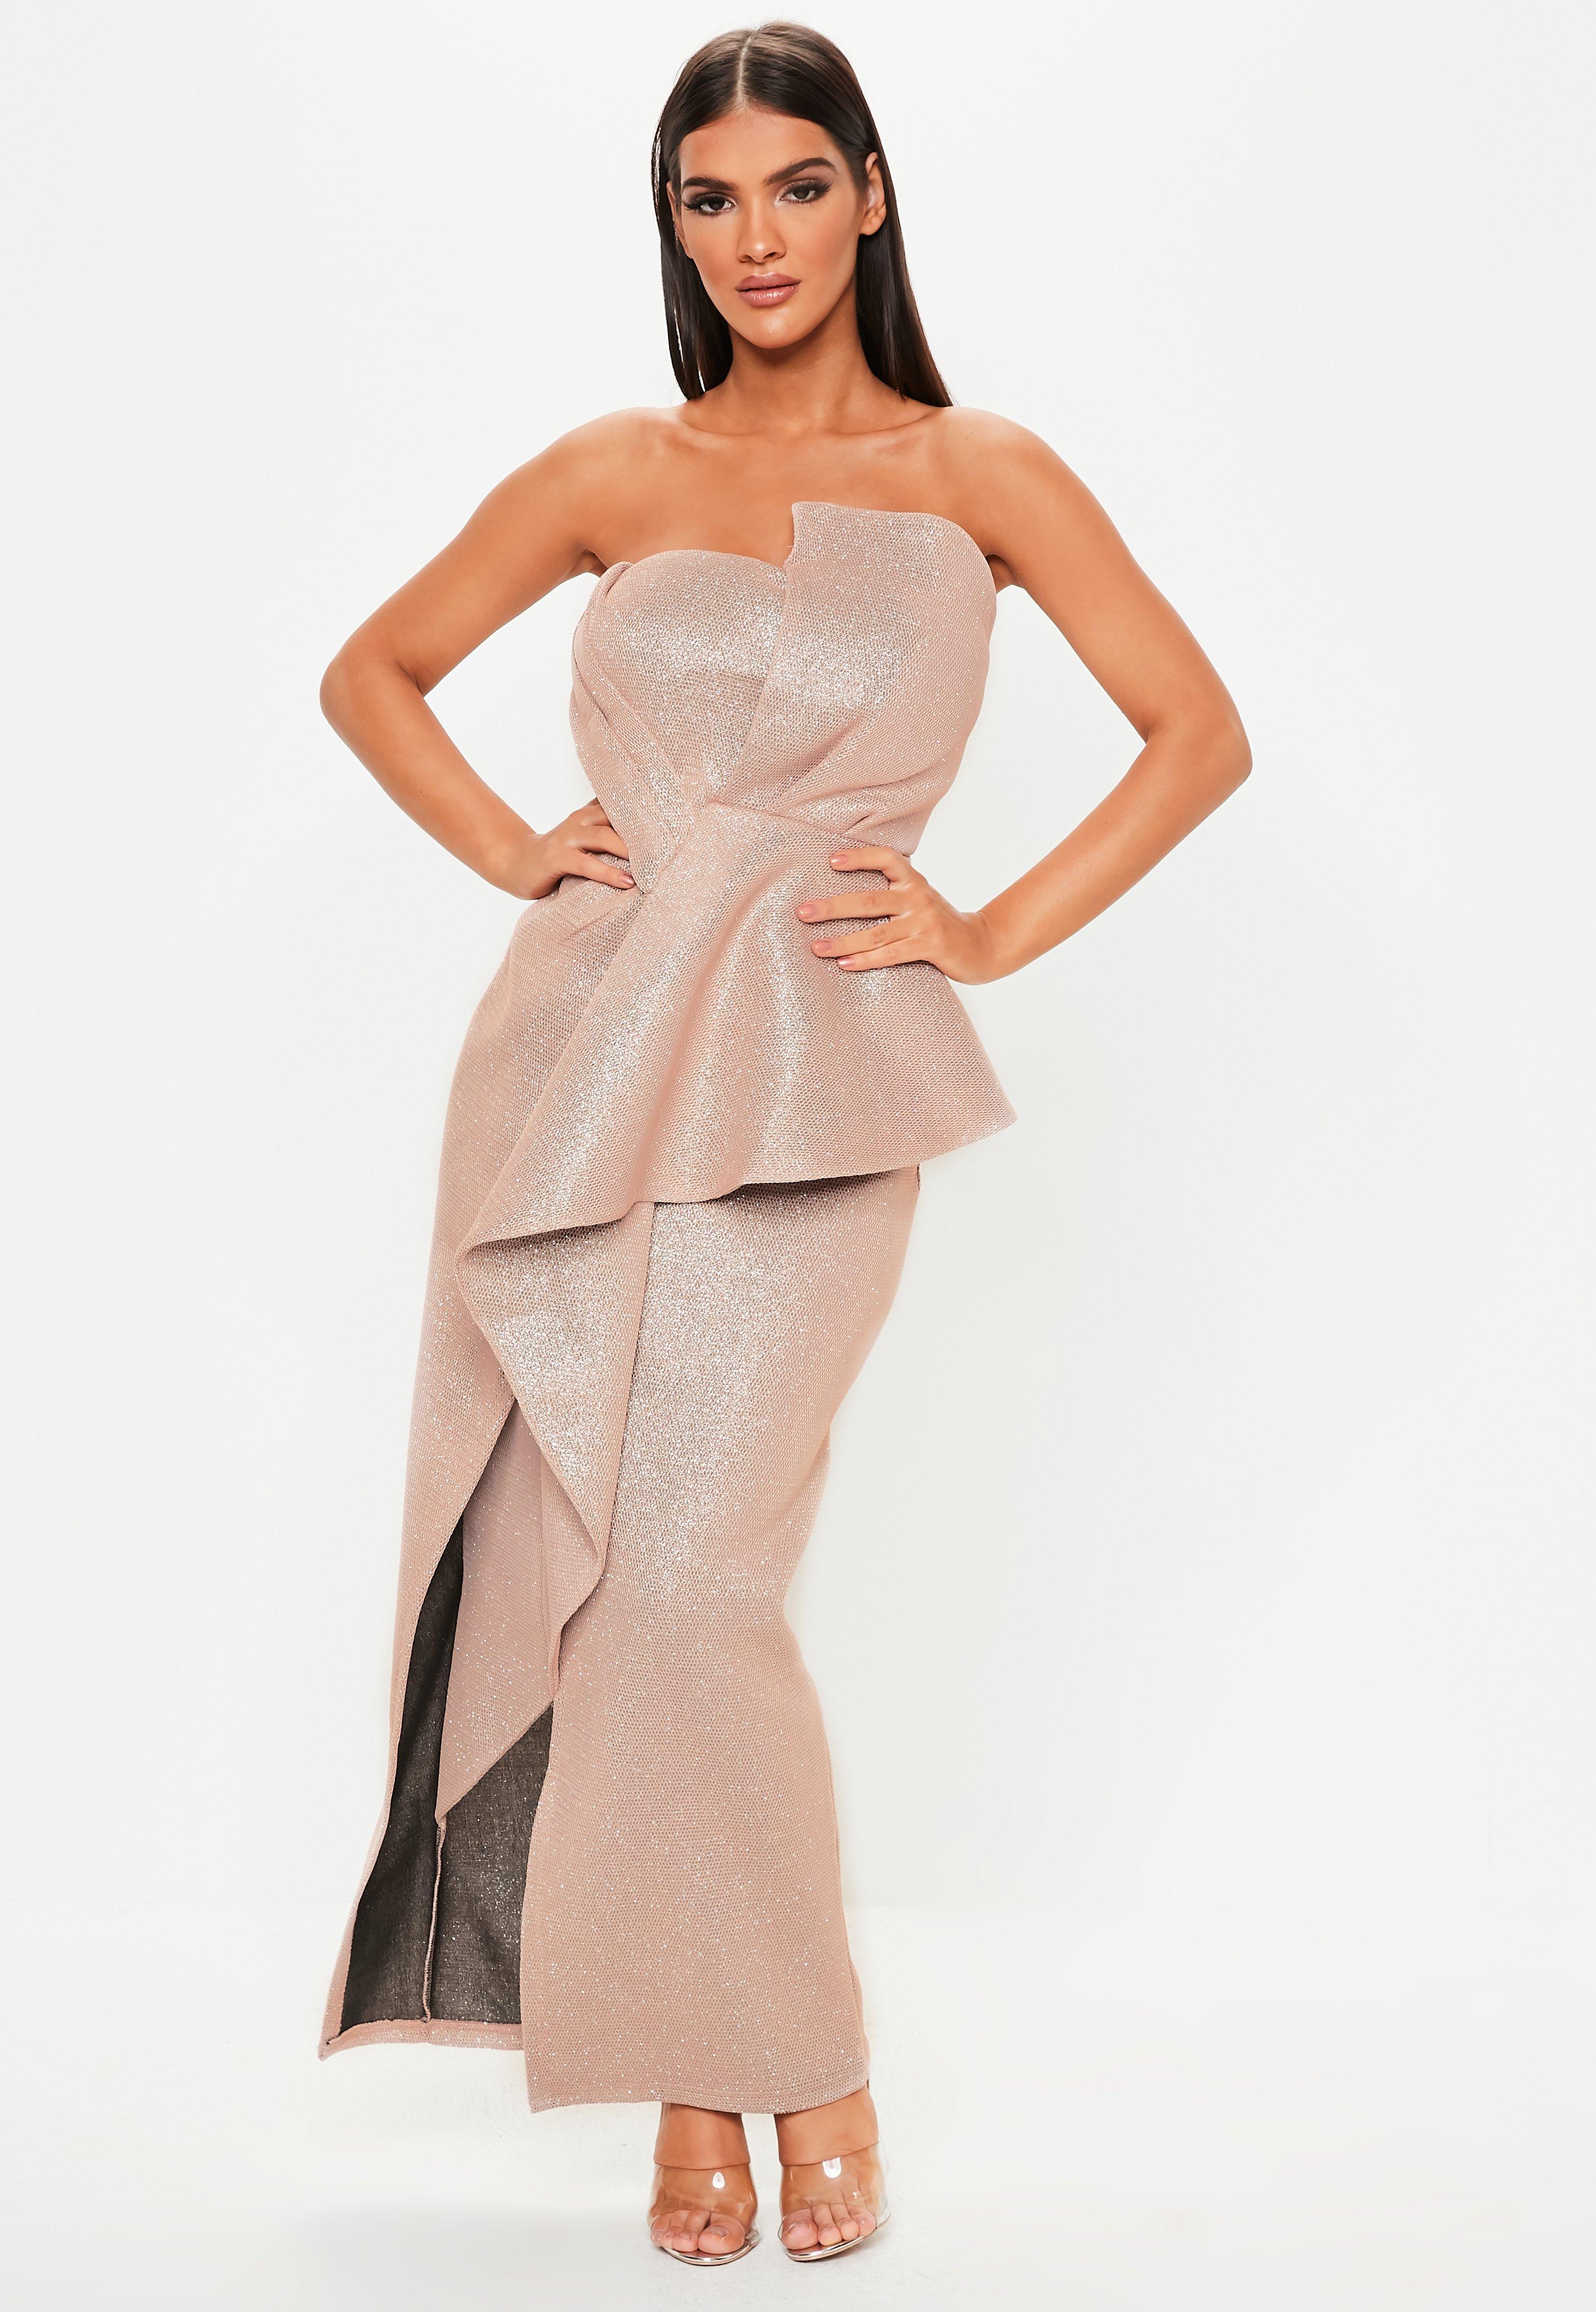 e63ffeaff0655b Missguided - Premium Pink Glitter Bandeau Ruffle Dress - Lyst. View  fullscreen